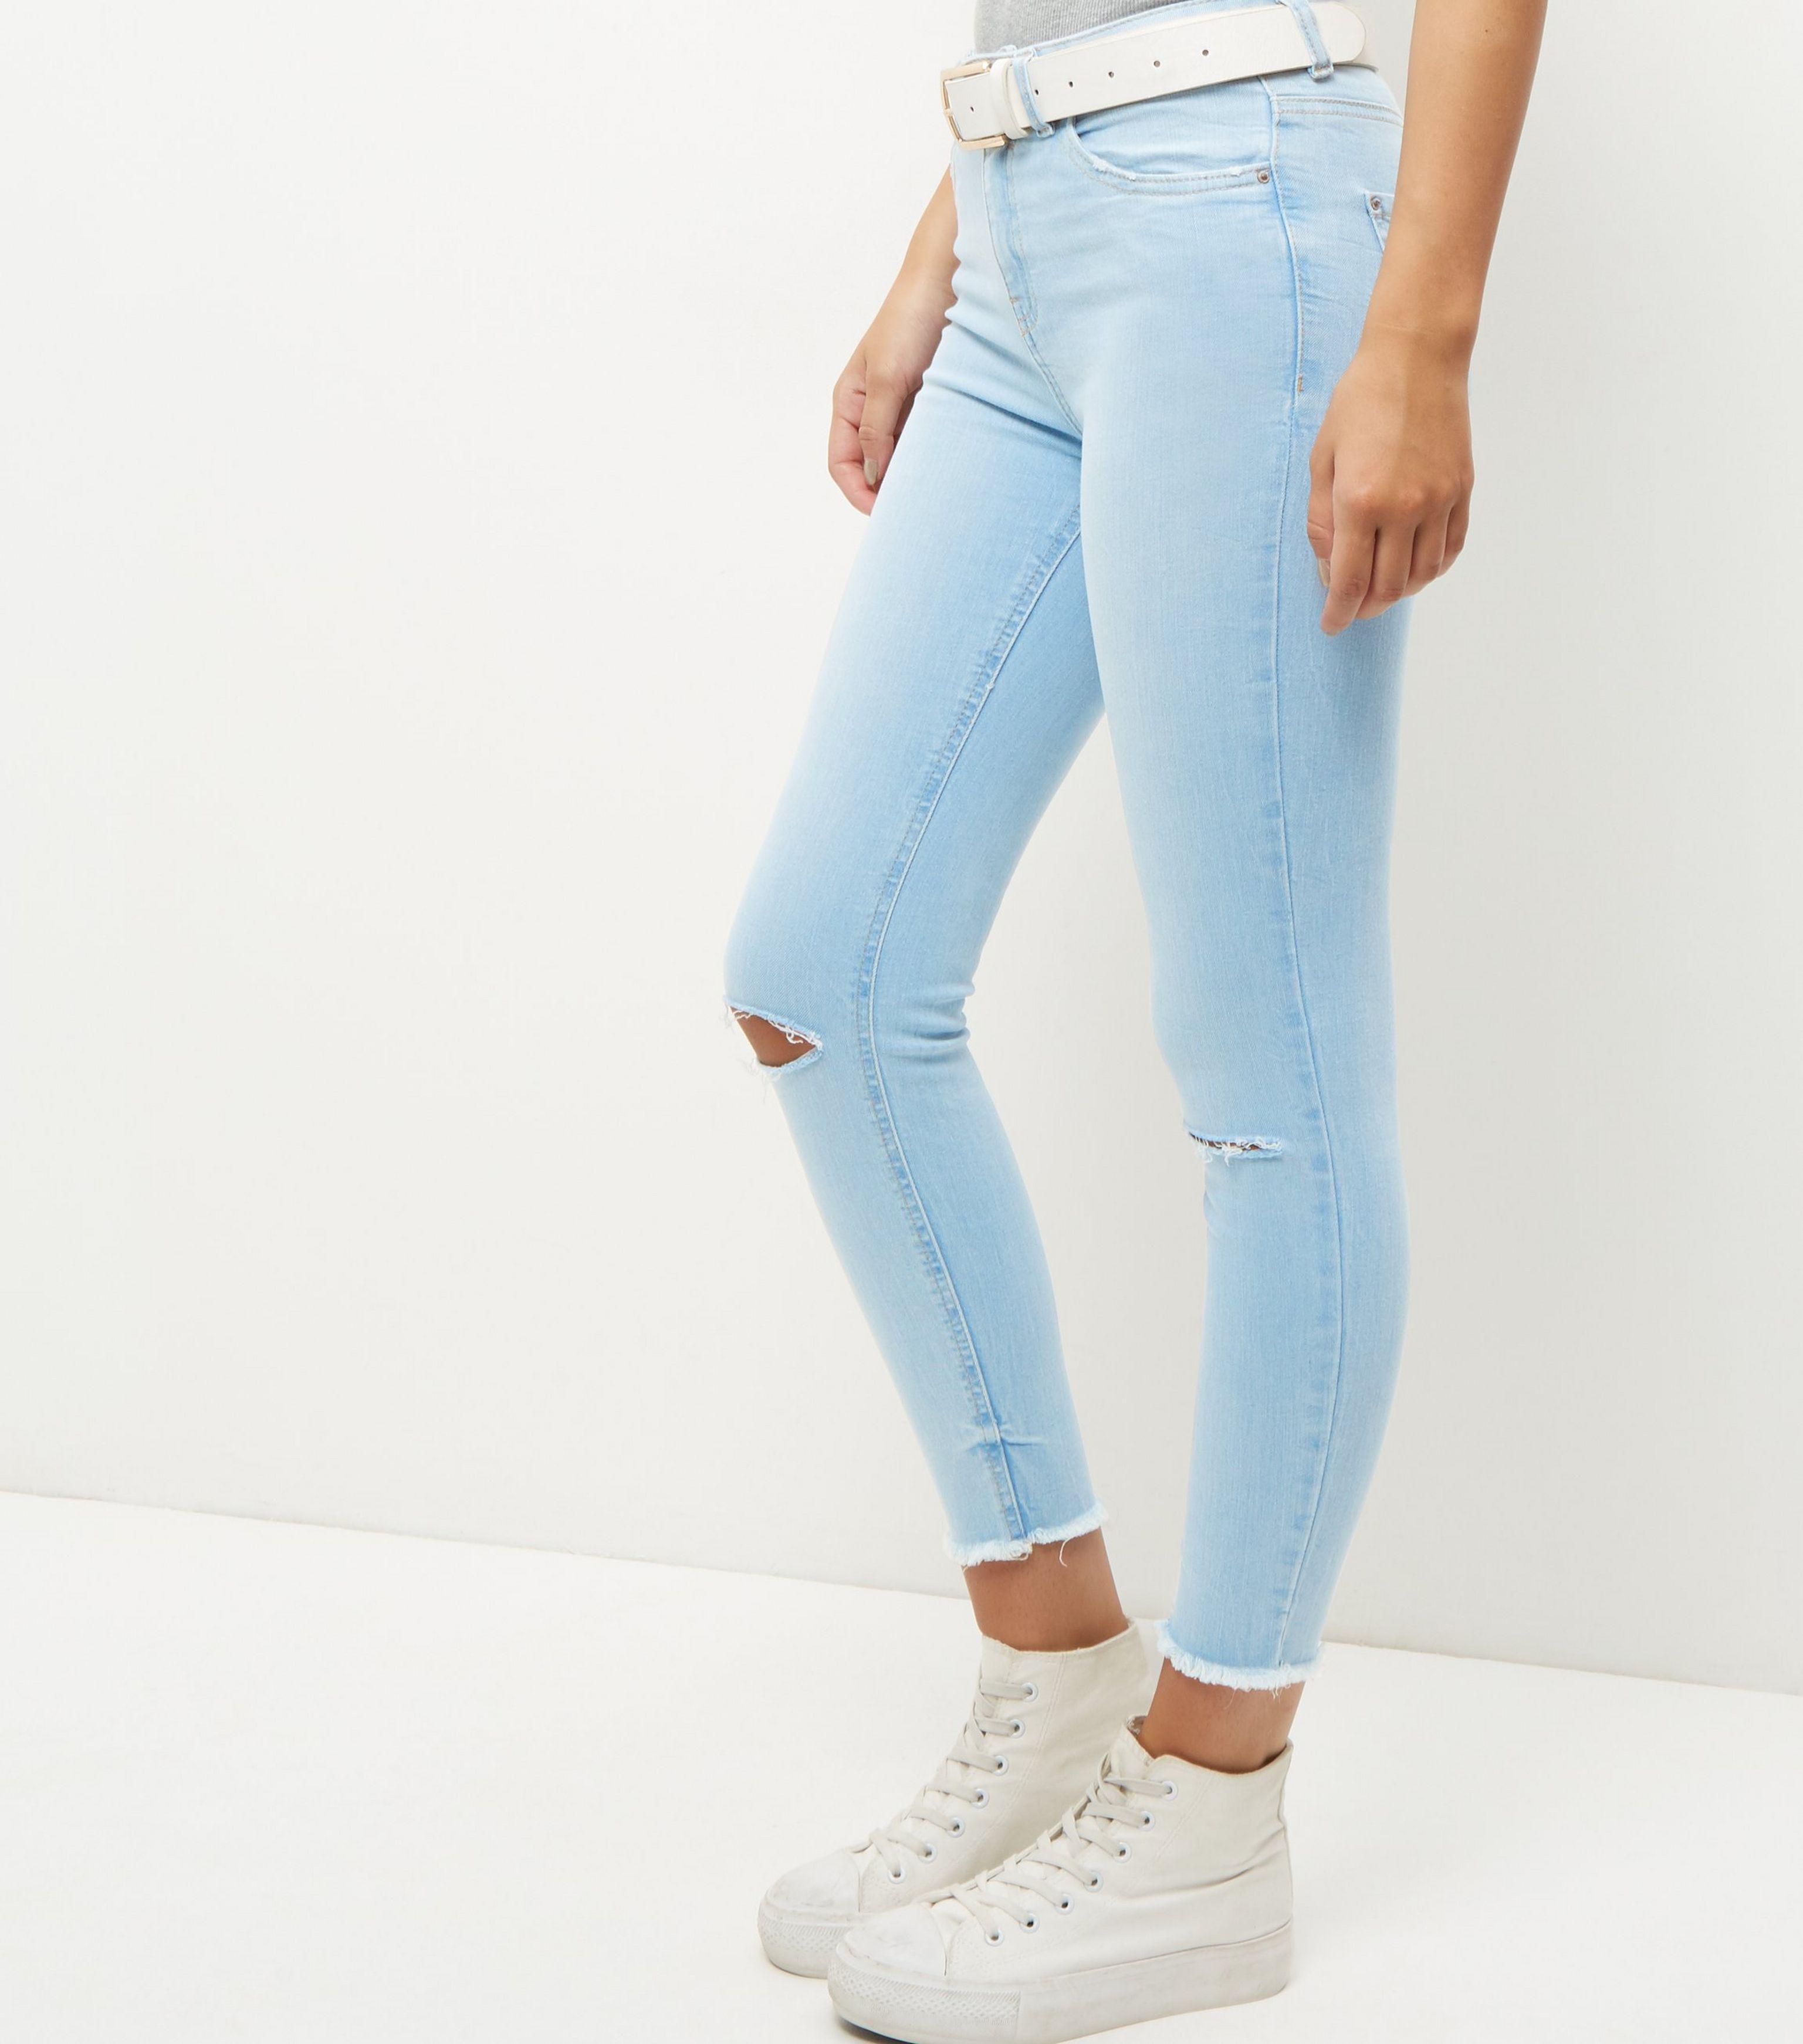 32b0fb34ef3 New Look Blue Fray Hem Ripped Knee Skinny Jeans in Blue - Lyst